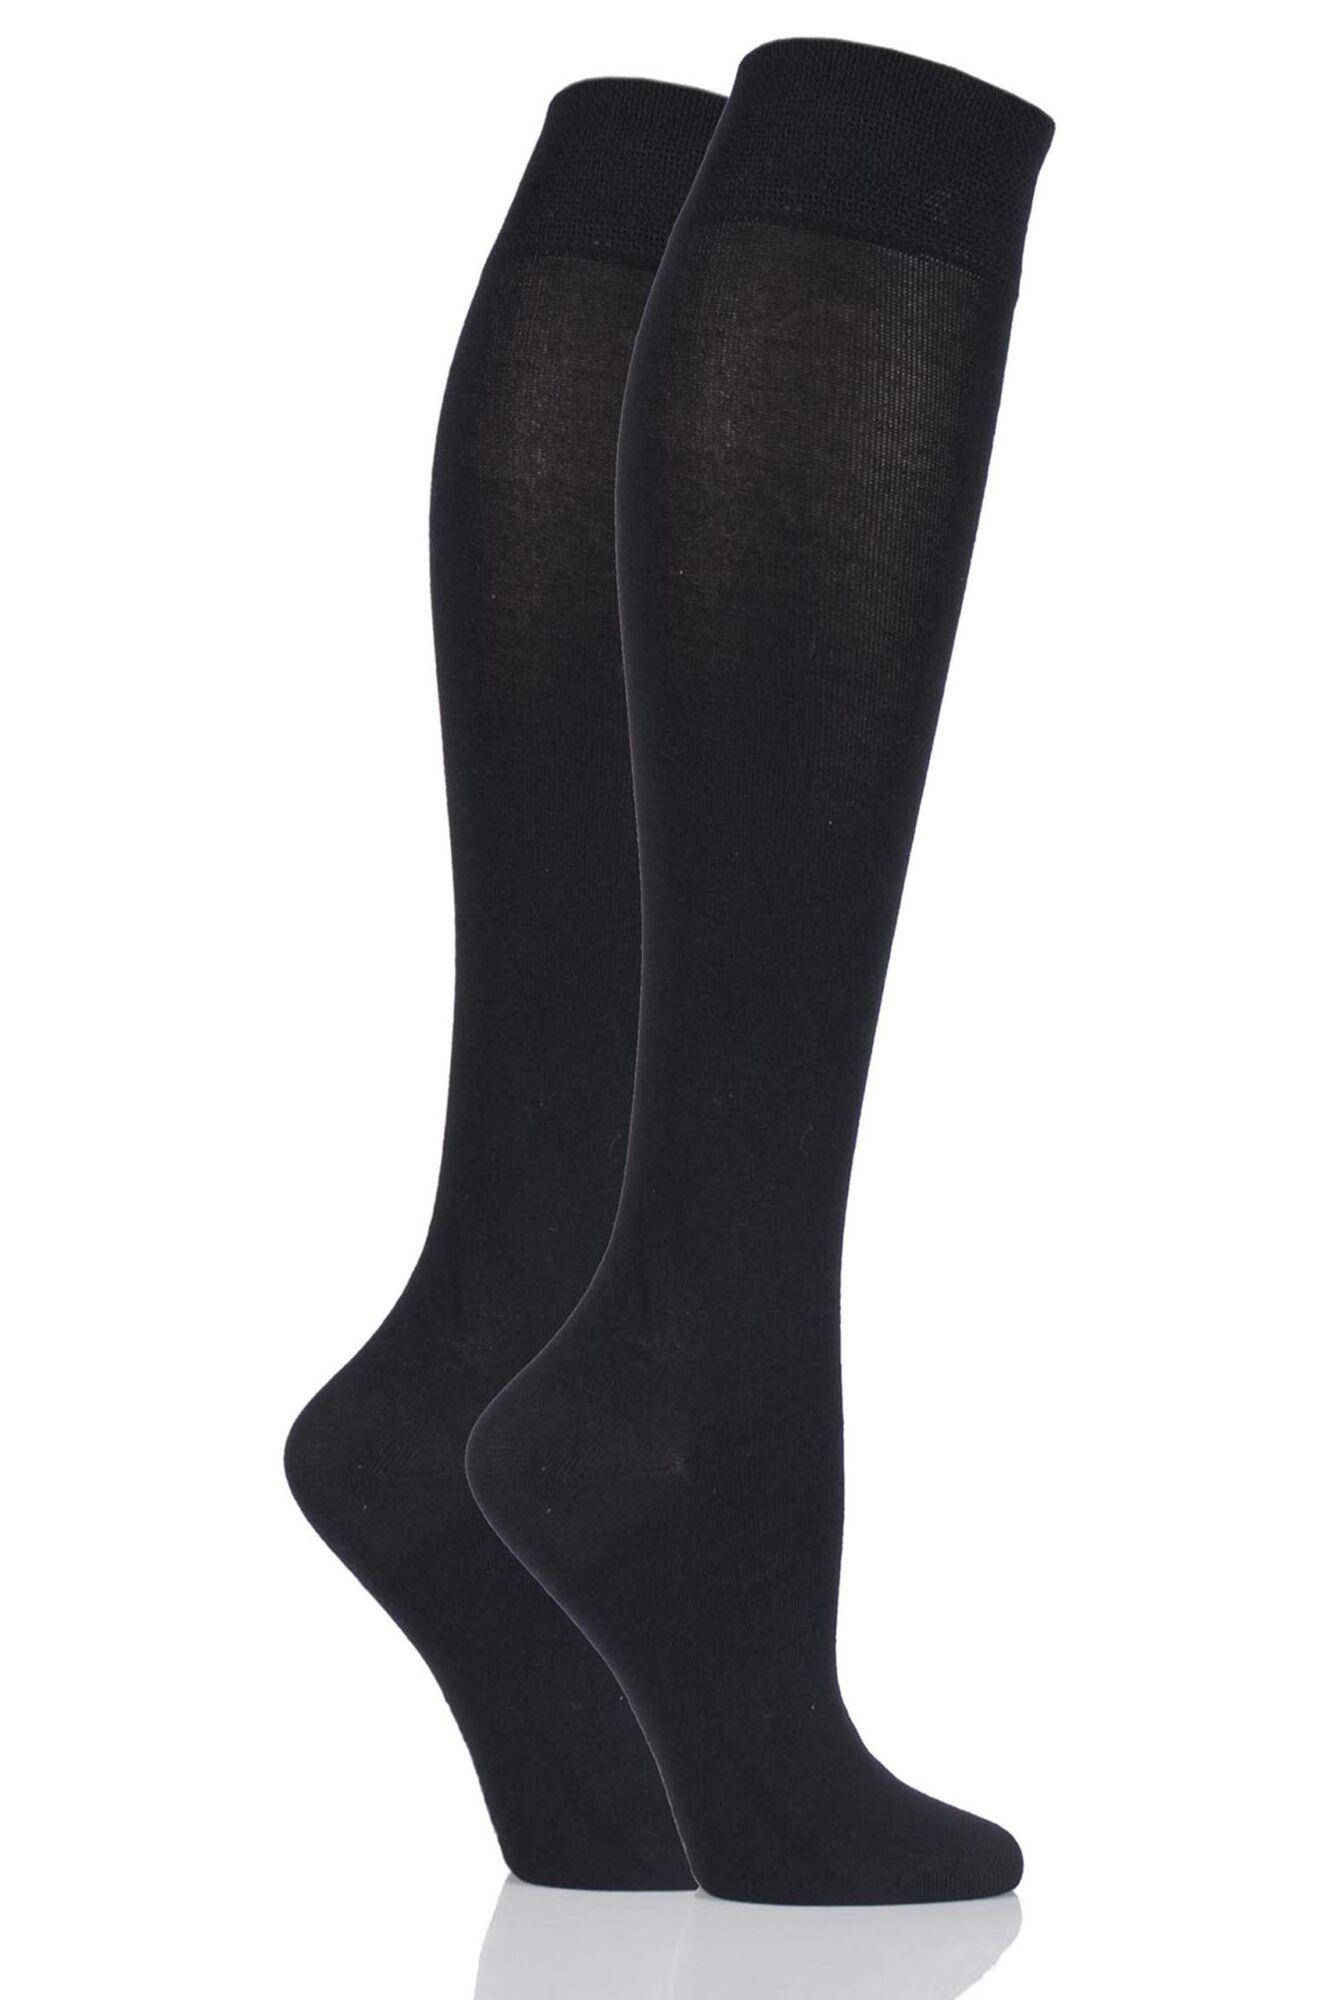 2 Pair Plain Bamboo Knee High Socks with Smooth Toe Seams Ladies - SOCKSHOP